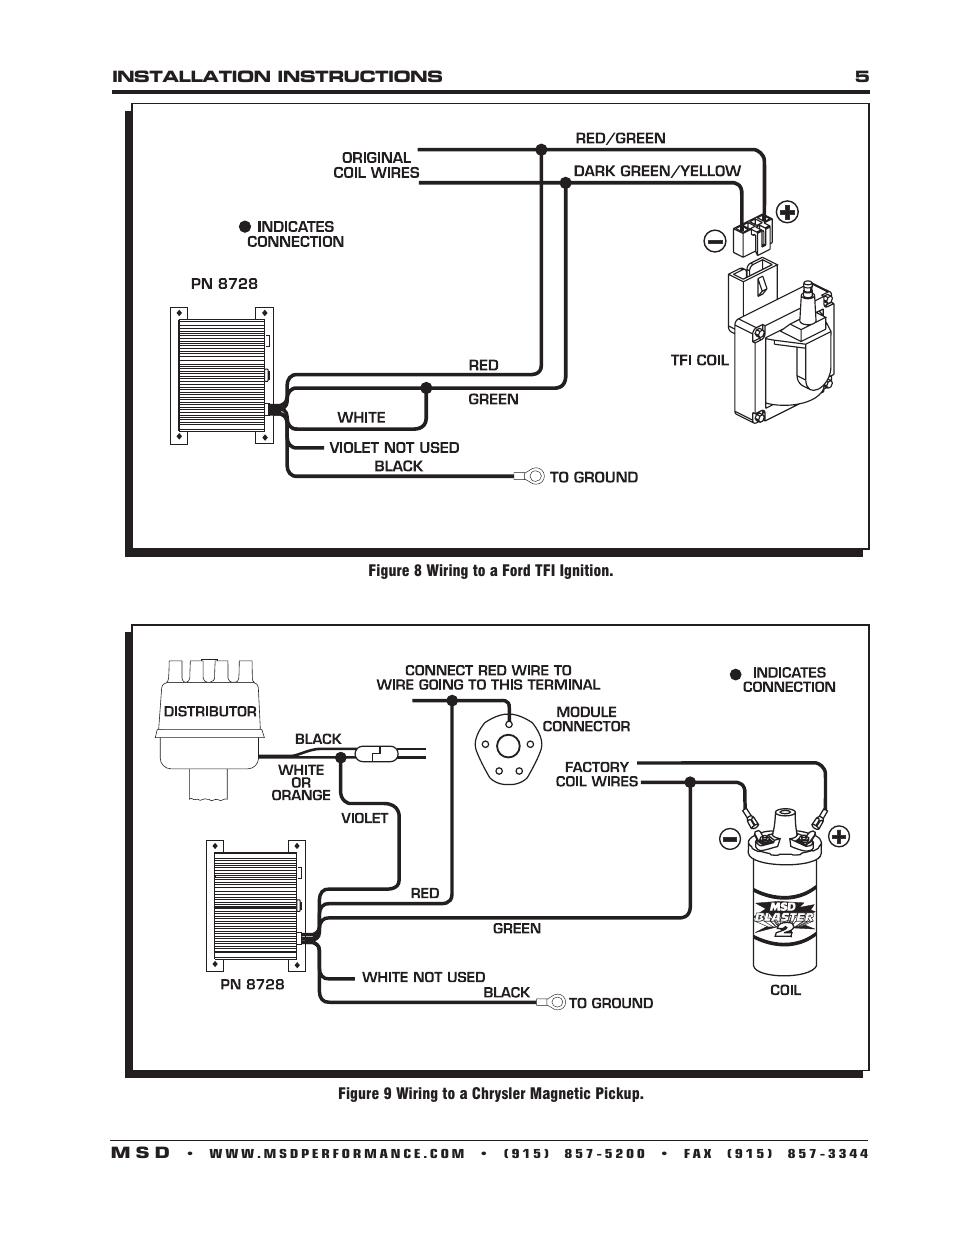 msd 8972 wiring diagram wiring diagrams msd 6425 wiring-diagram msd box wiring diagram #12